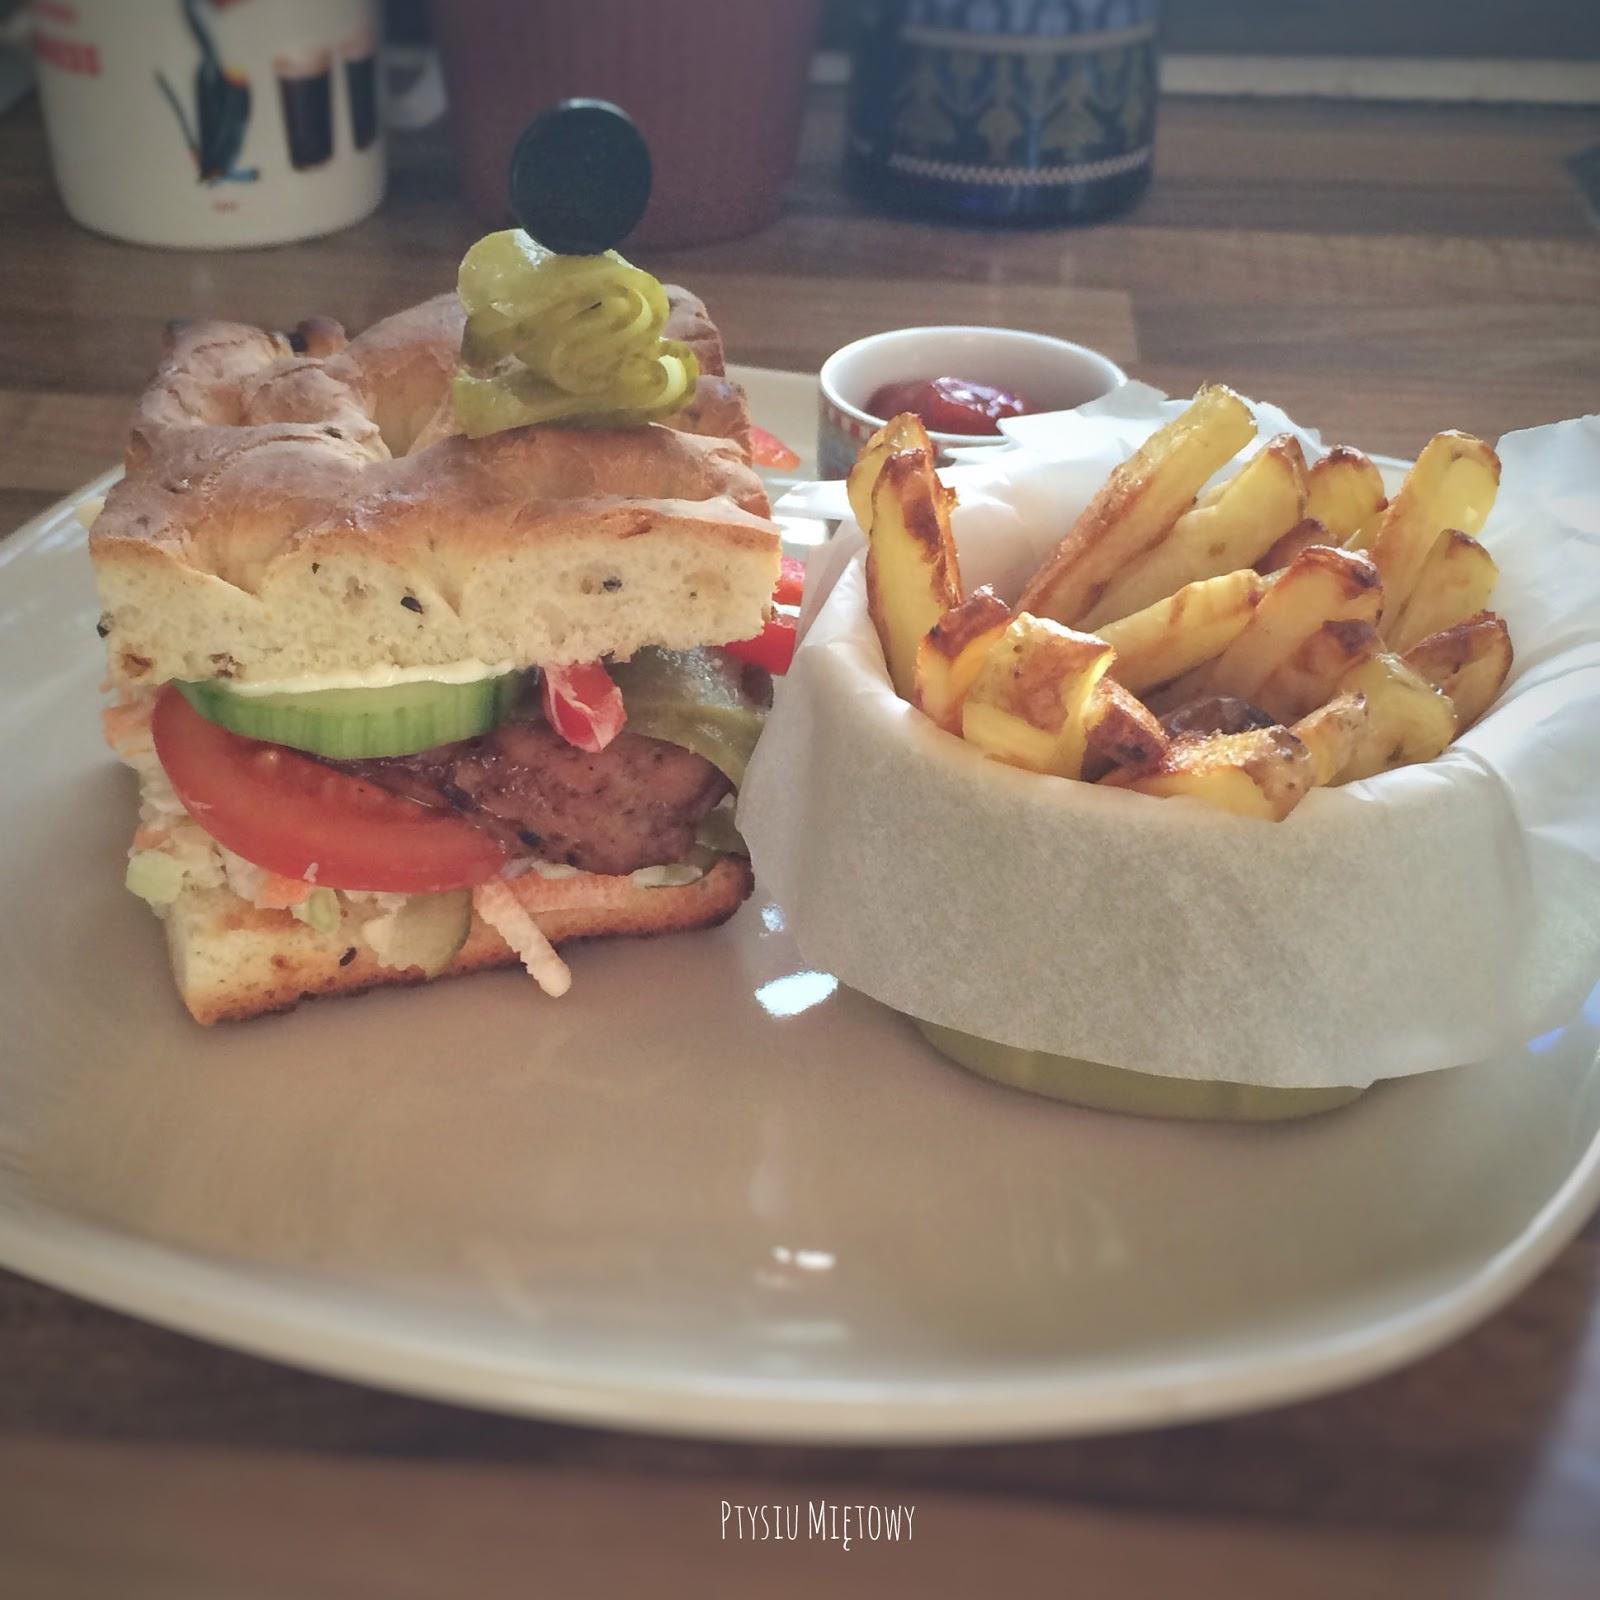 burgery, ptysiu mietowy